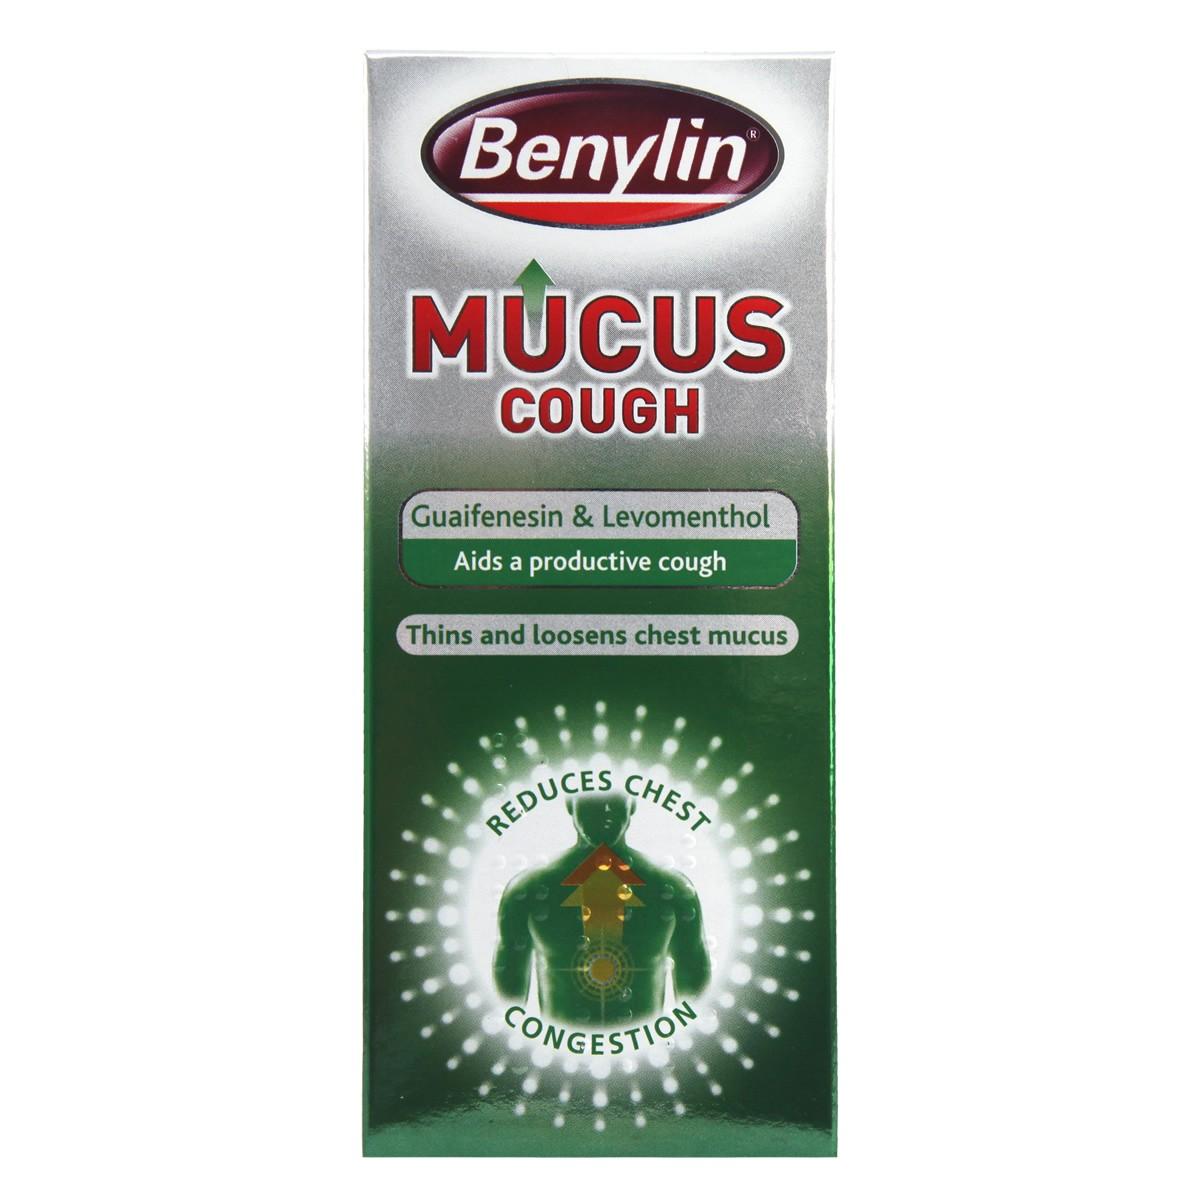 Echemist benylin mucus cough benylin mucus cough nvjuhfo Image collections